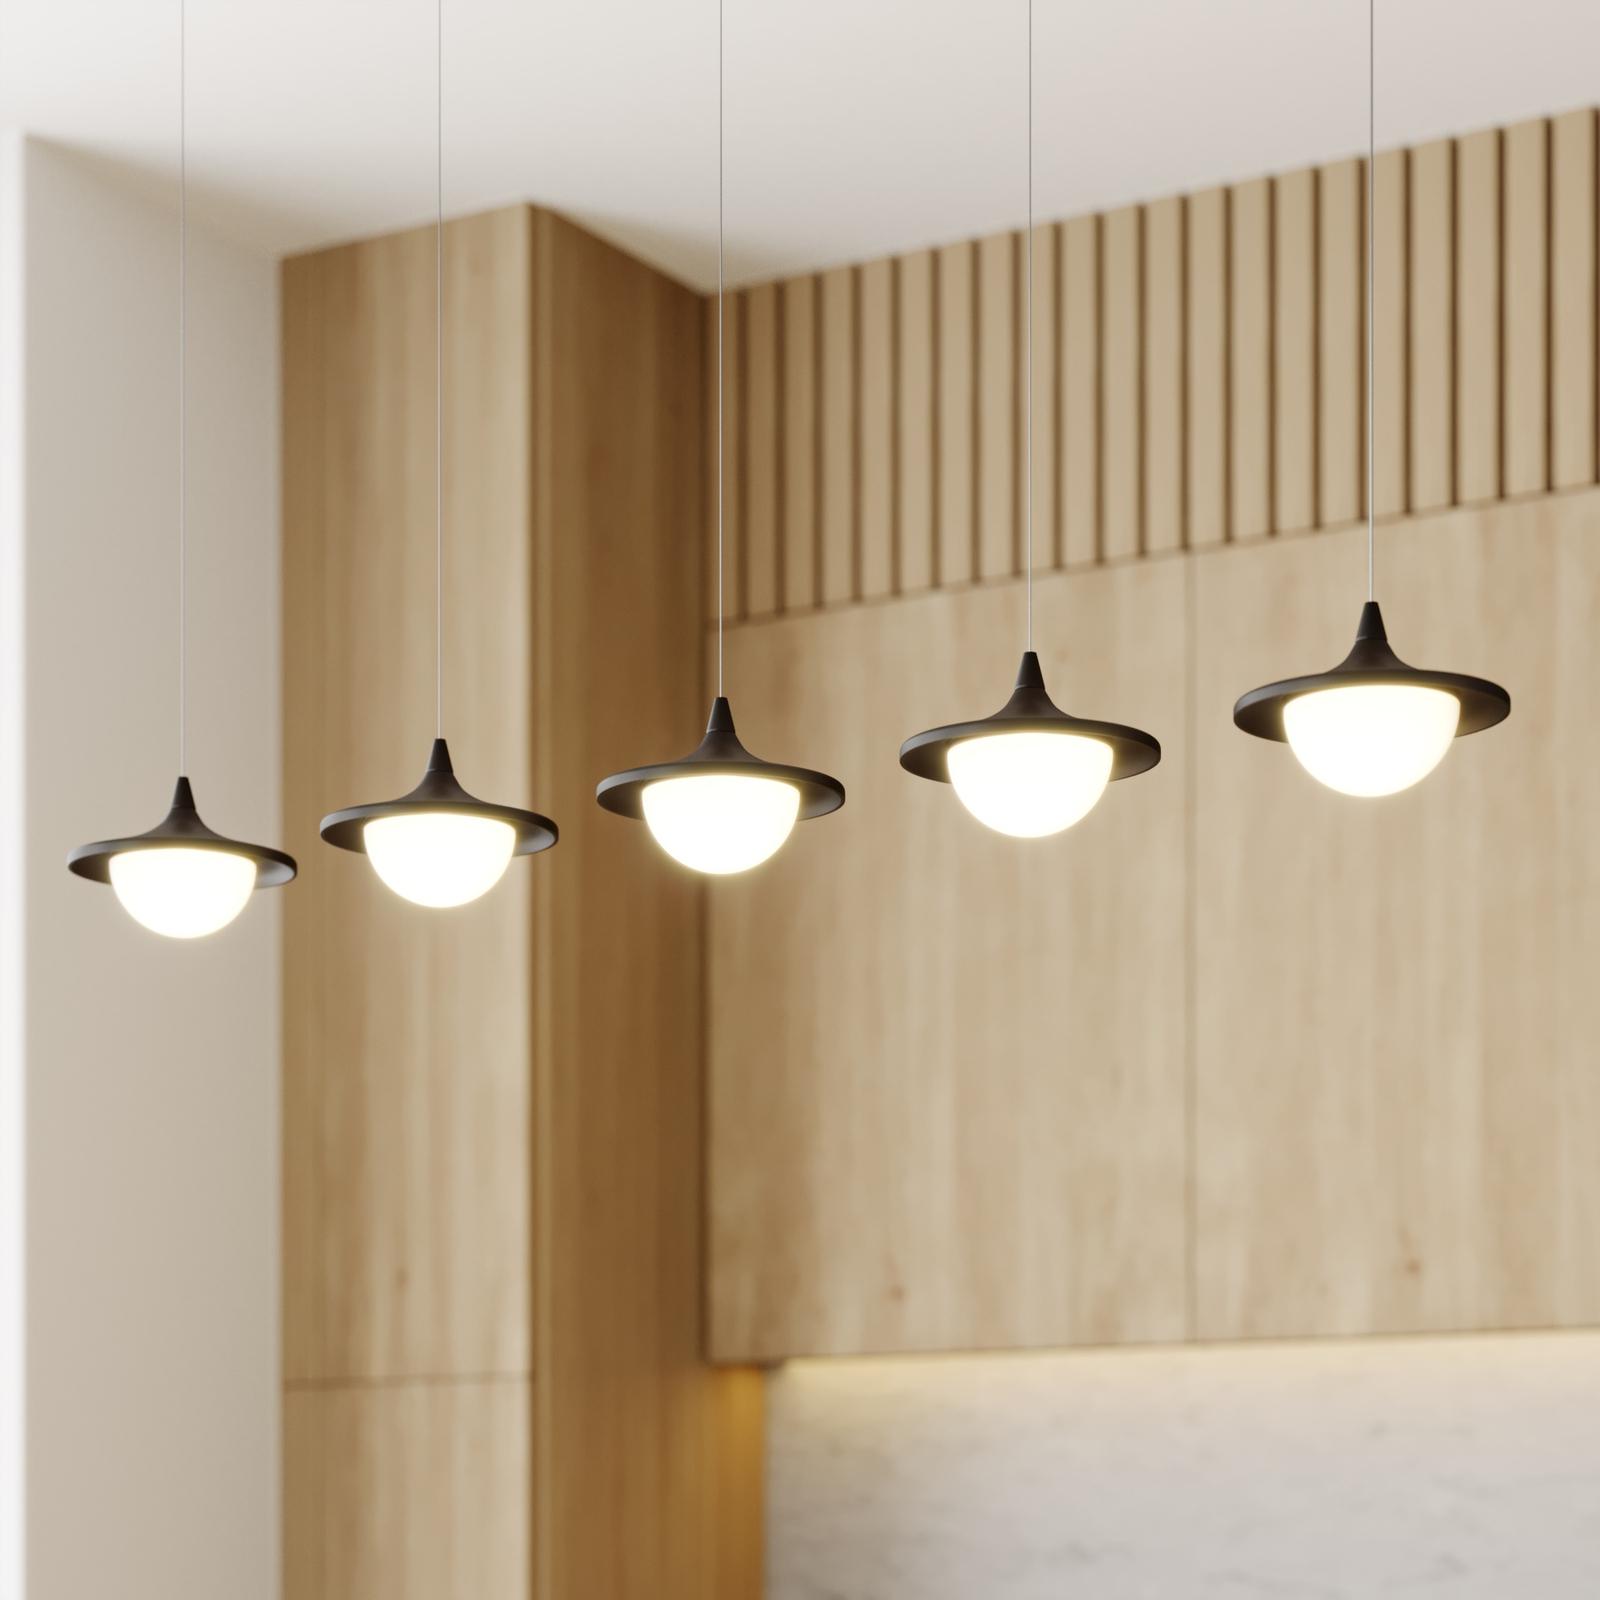 Lucande Tamsi LED-Hängeleuchte, 5-flammig, dimmbar